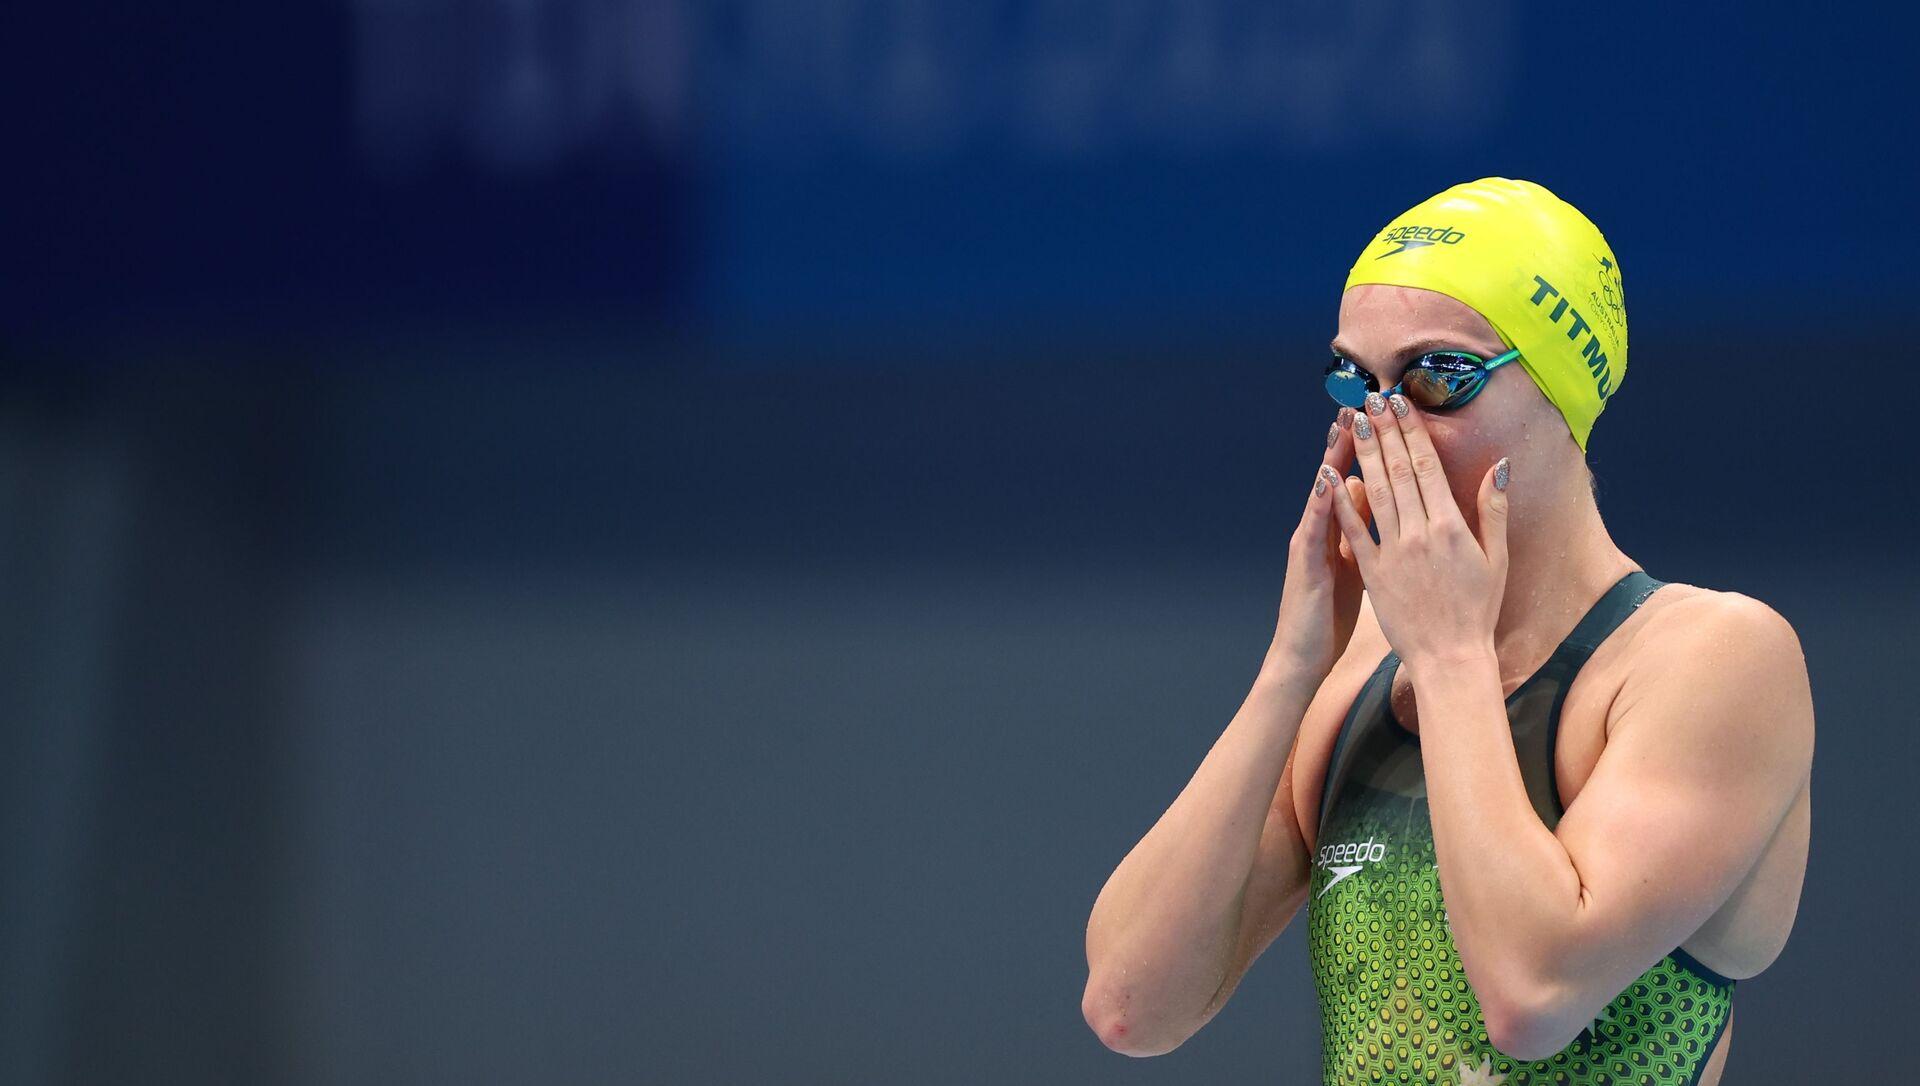 Tokyo 2020 Olympics - Swimming - Women's 200m Freestyle - Heats - Tokyo Aquatics Centre - Tokyo, Japan - July 26, 2021. Ariarne Titmus of Australia before the event  - Sputnik International, 1920, 27.07.2021